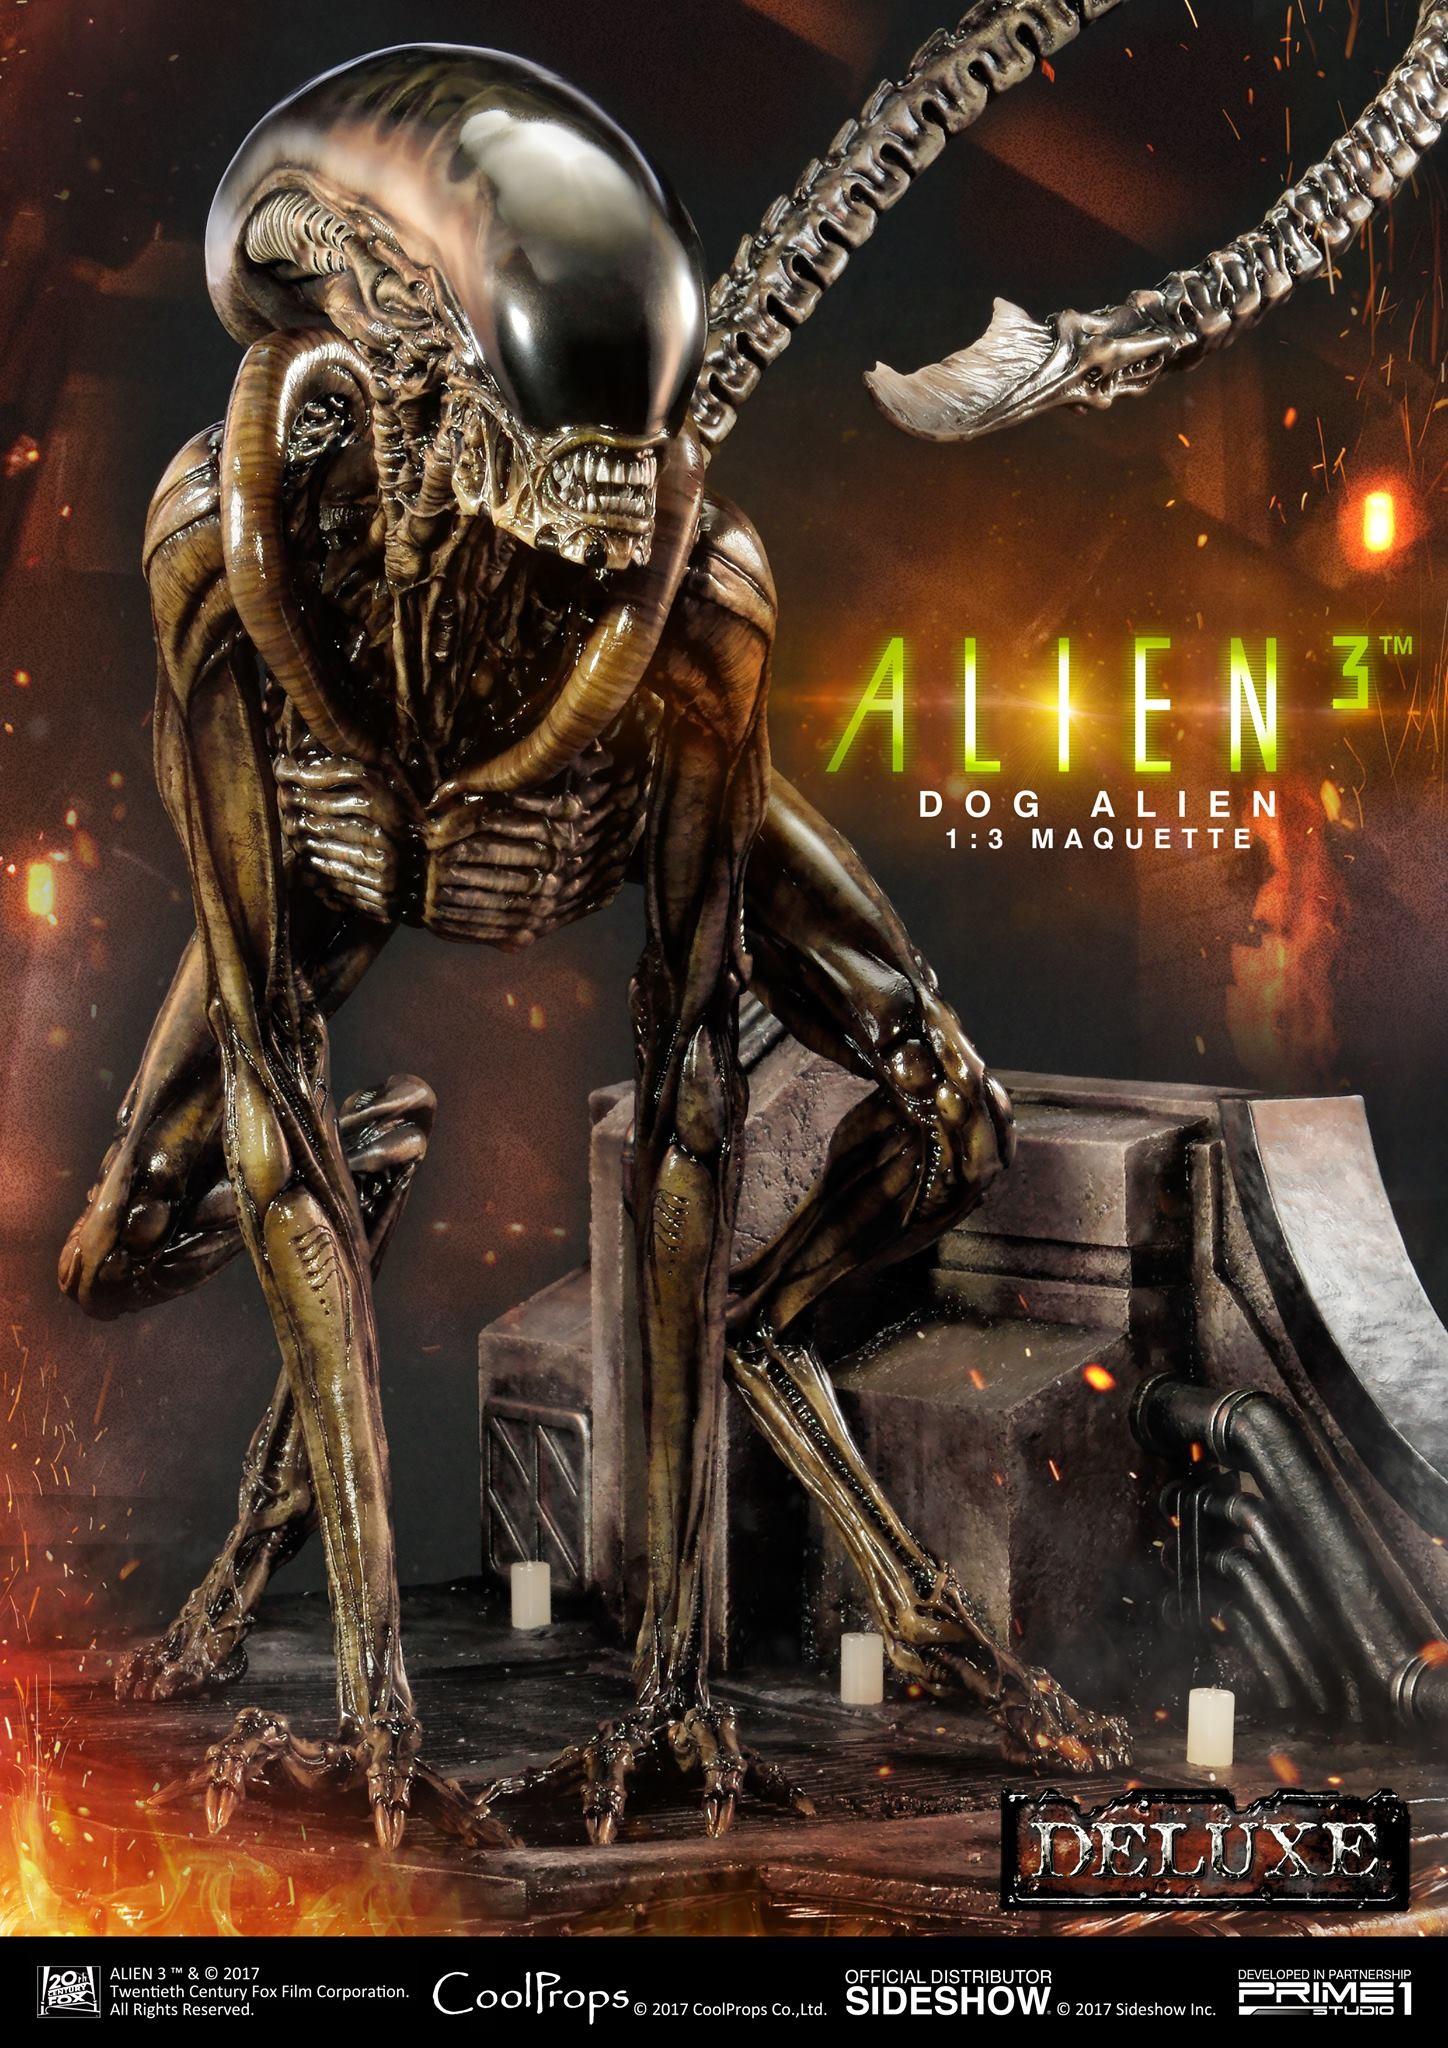 Abner marin alien 3 dog alien maquette 001